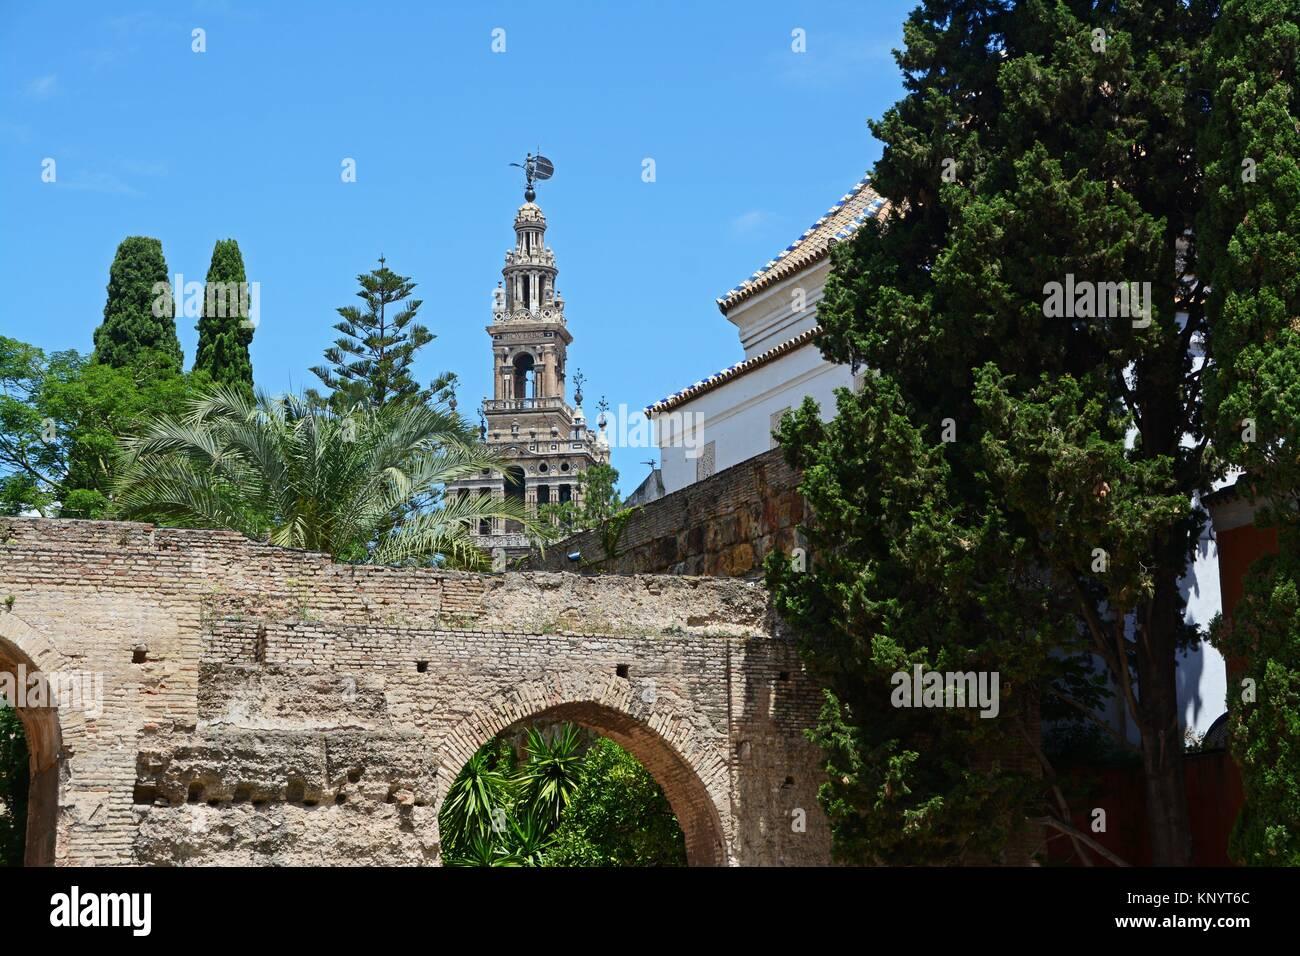 La Giralda as seen from the Patio de la Monteria. Real Alcazar. Seville, Andalucia, Spain, Europe. Keywords: - Stock Image